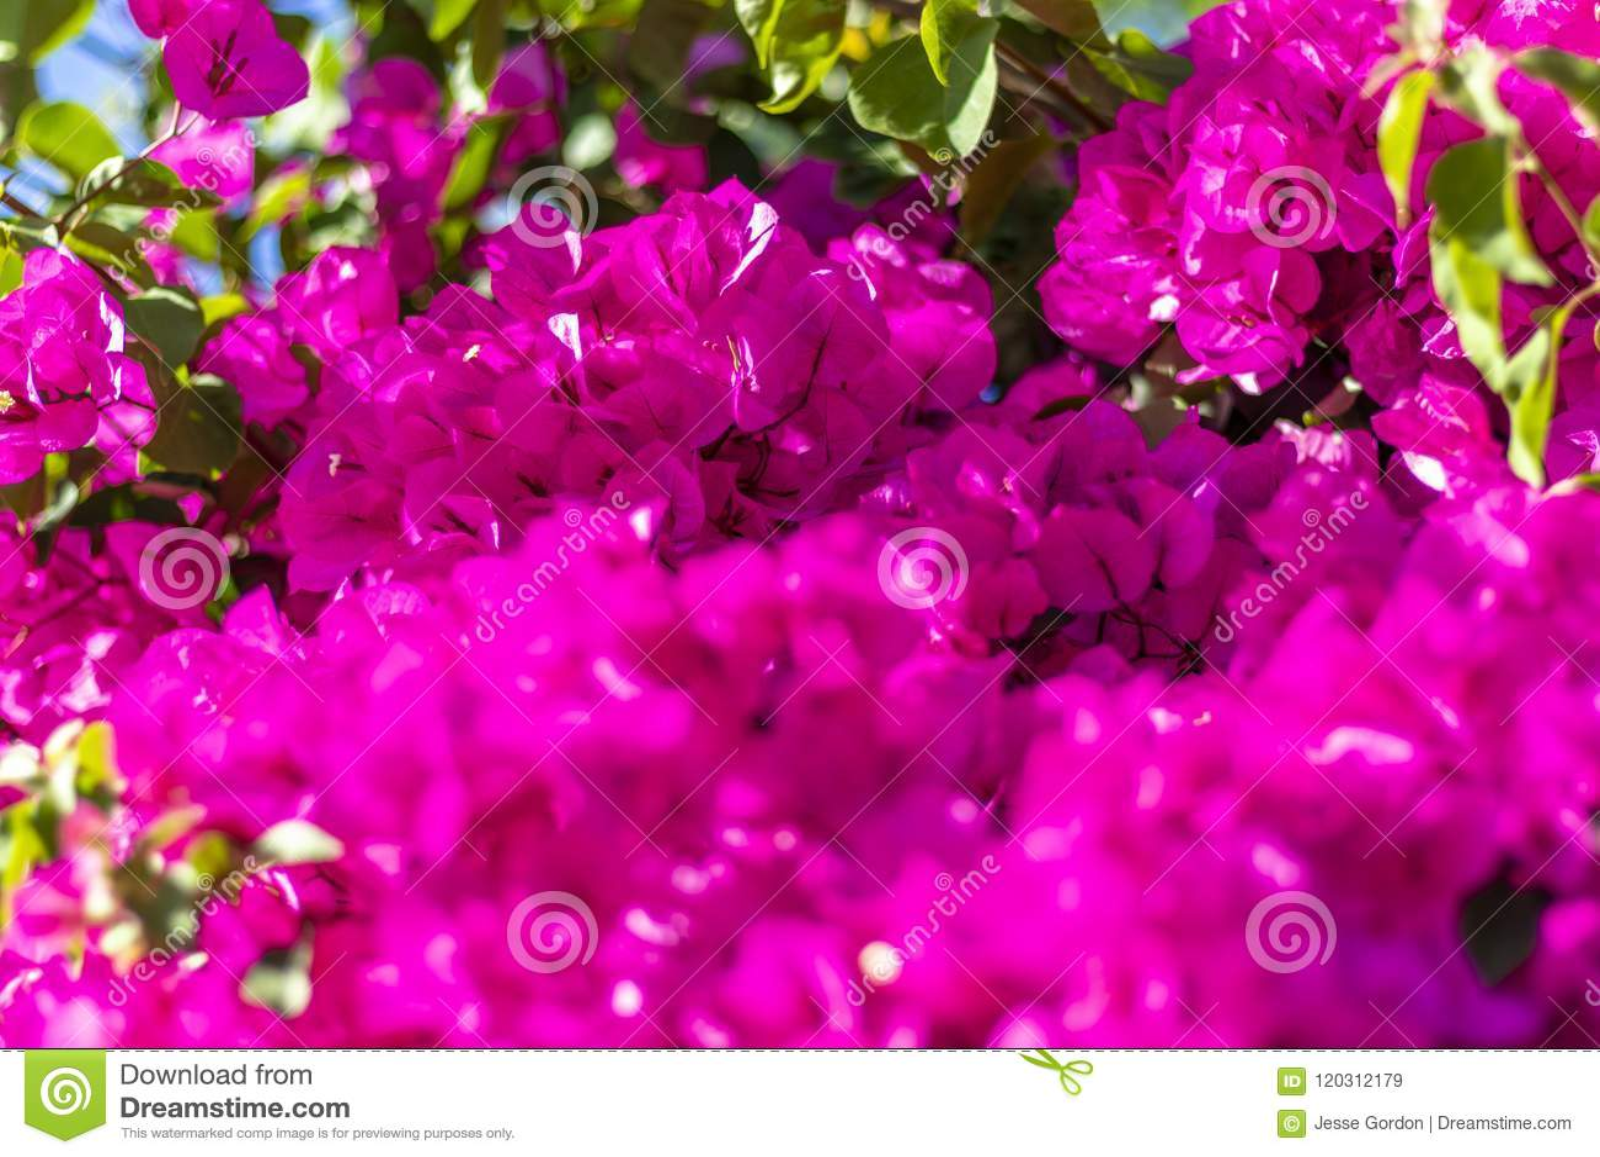 Vivid Pink Flower Bush Blossoming Stock Image Image Of Bush Pink